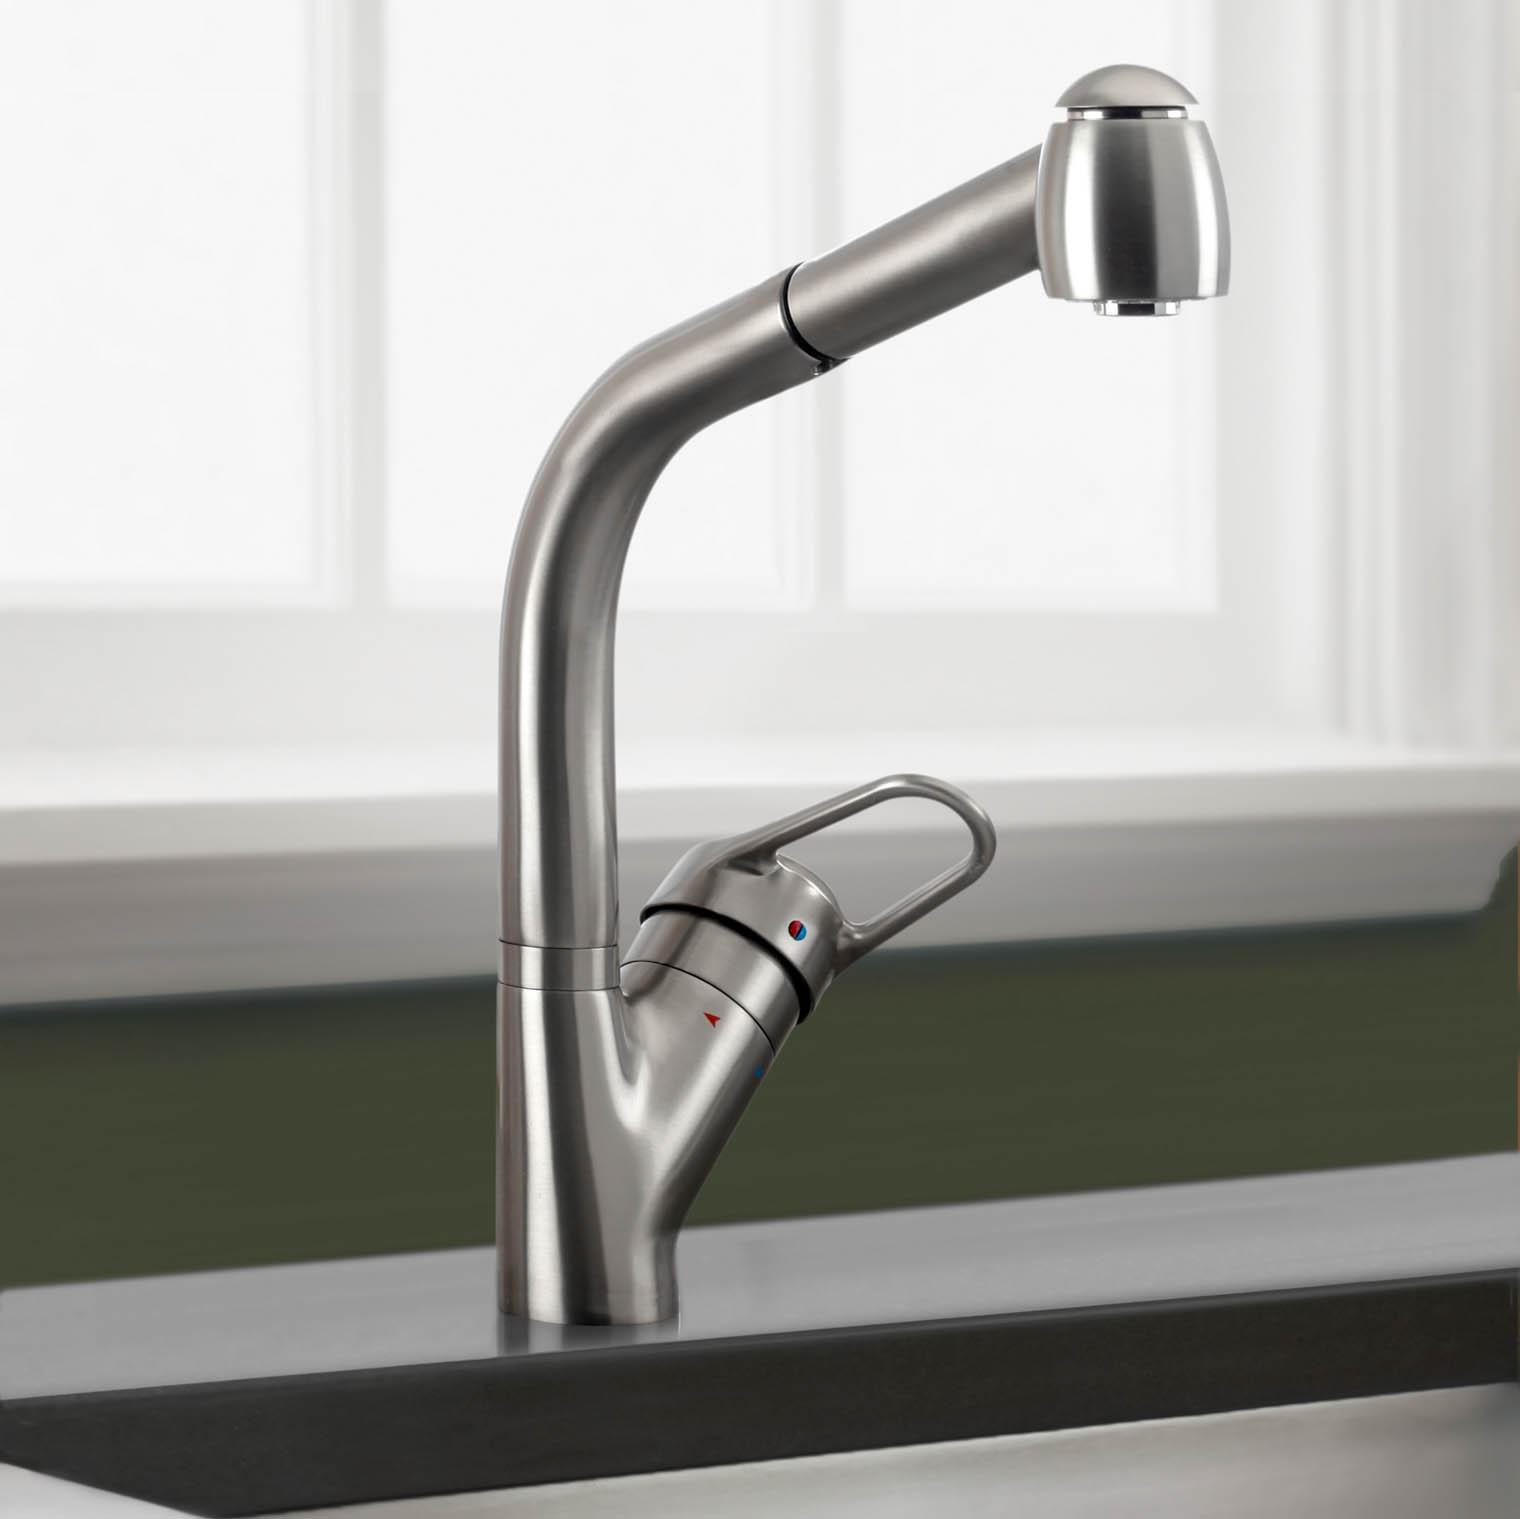 blanco hydra faucet - Blanco Faucets